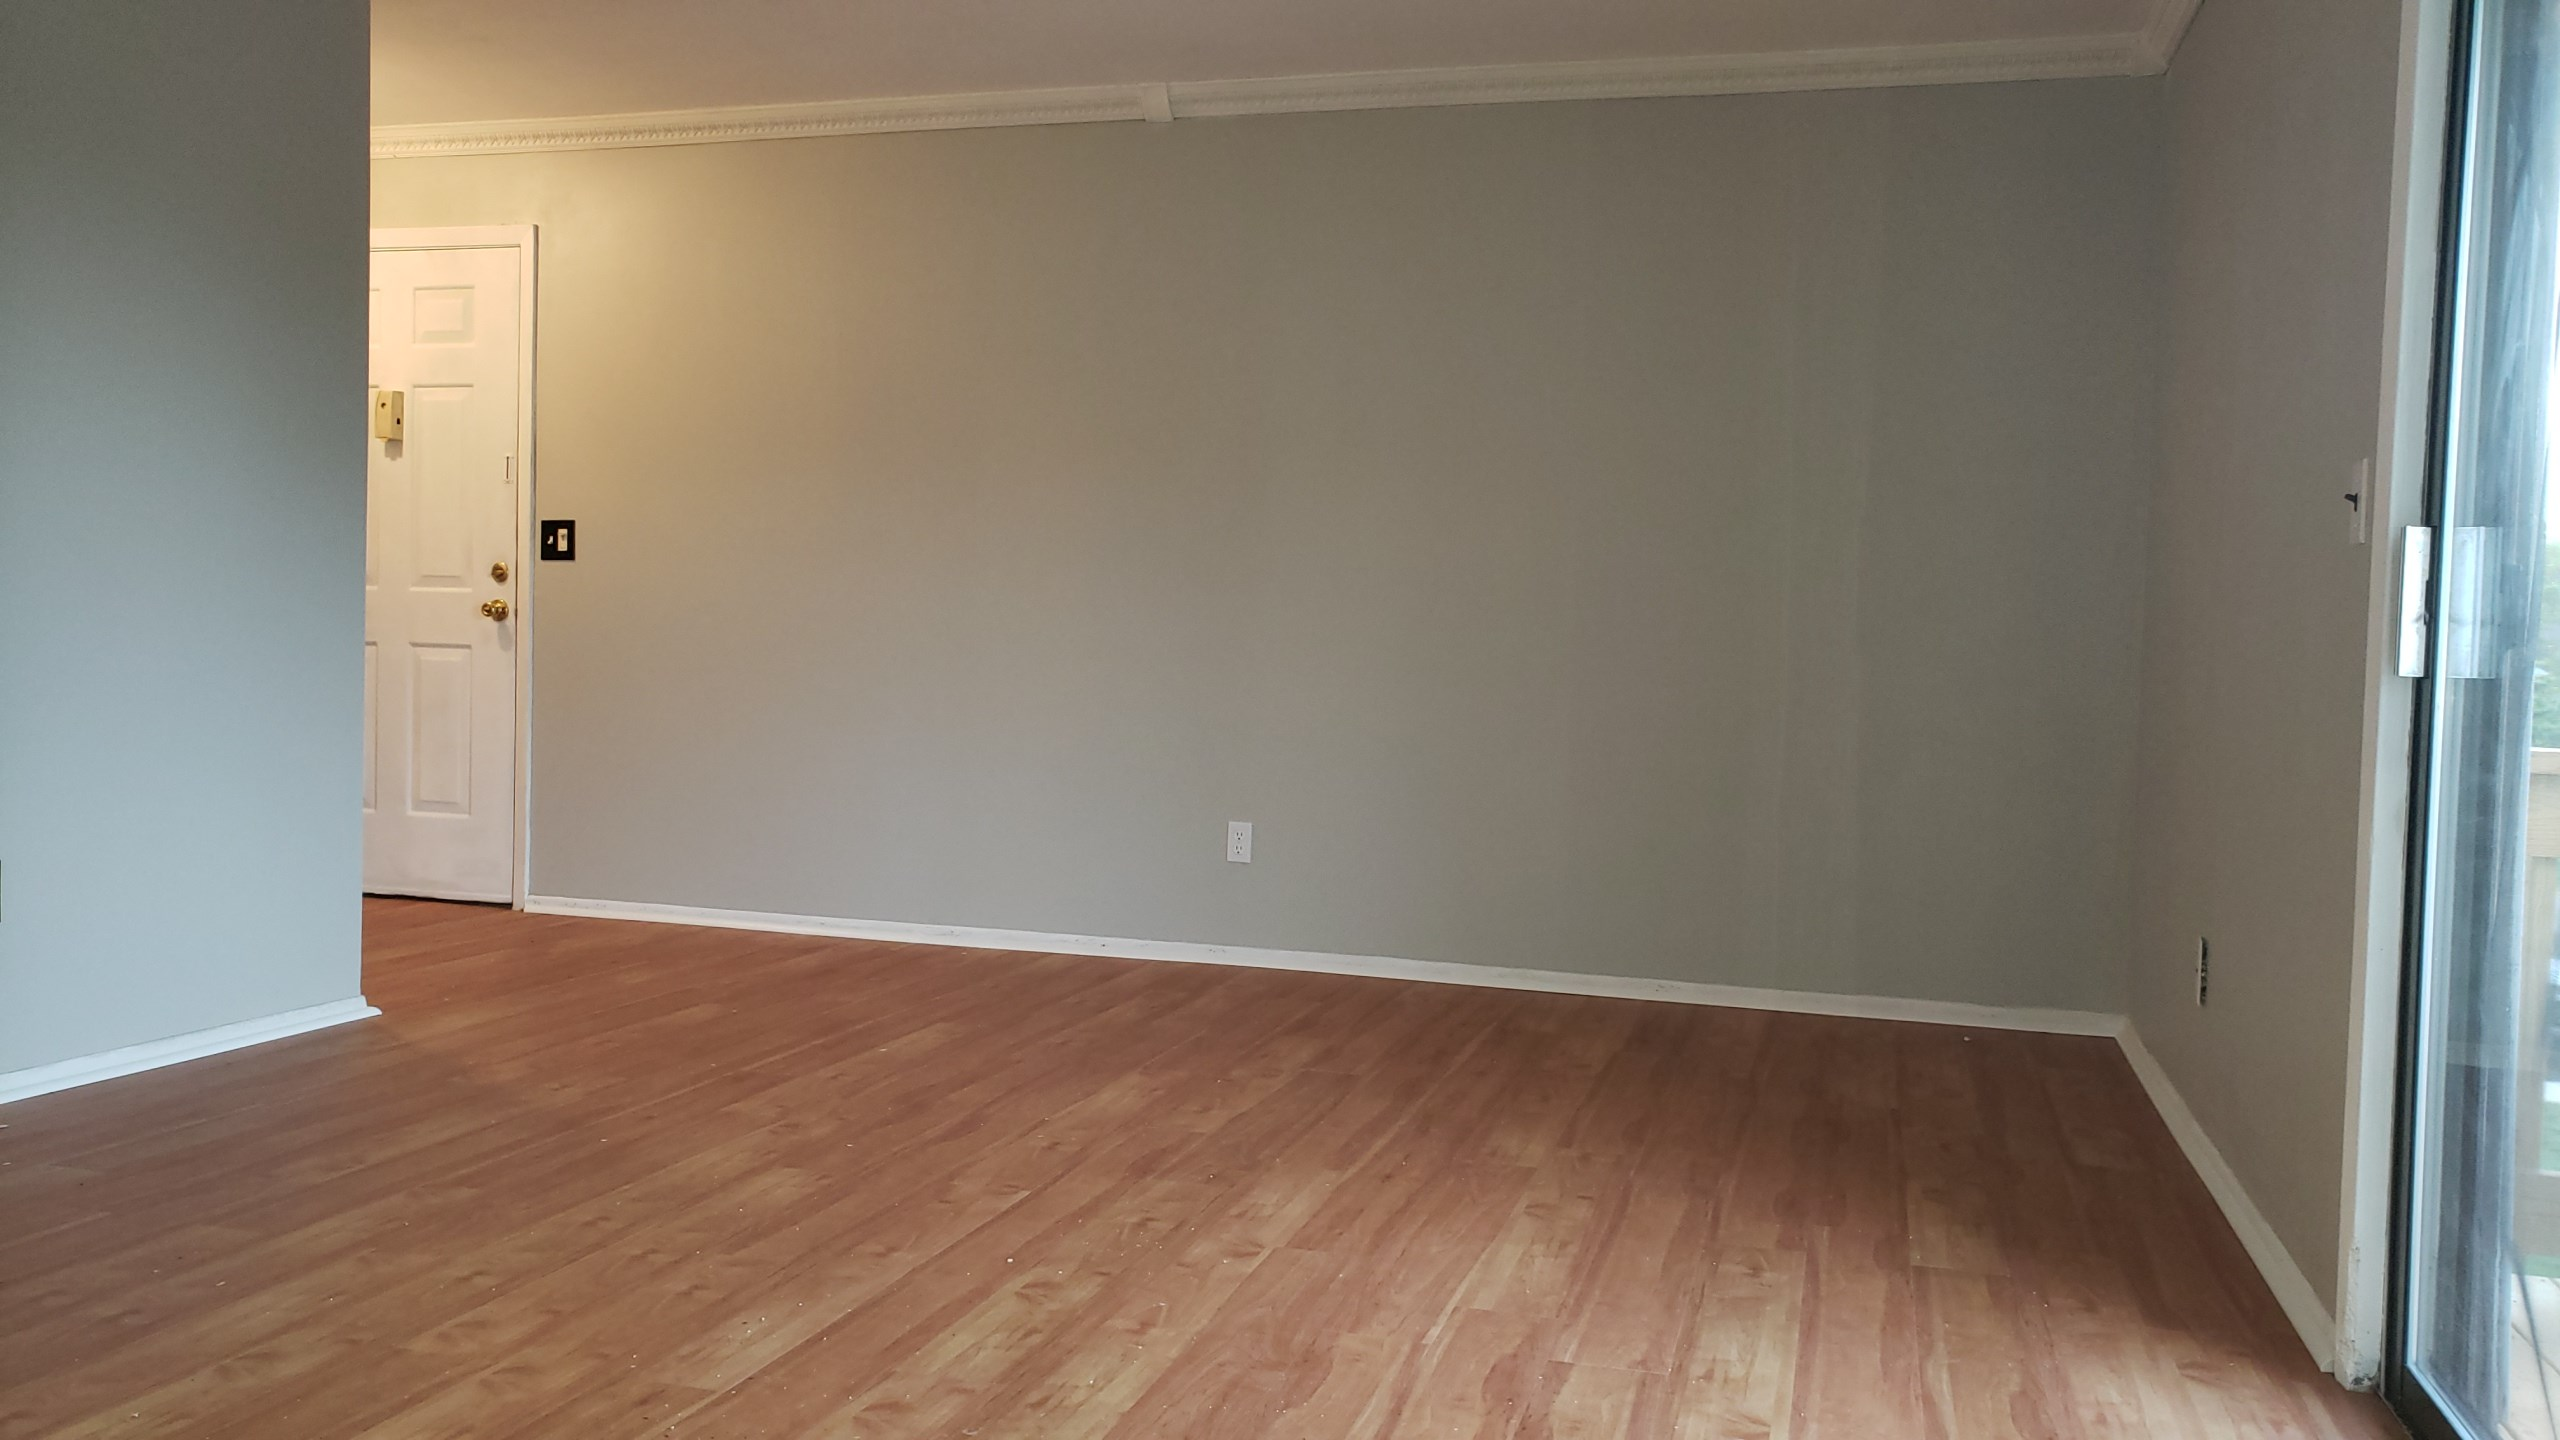 Rooms for Rent Bridgewater, NJ – Apartments, House